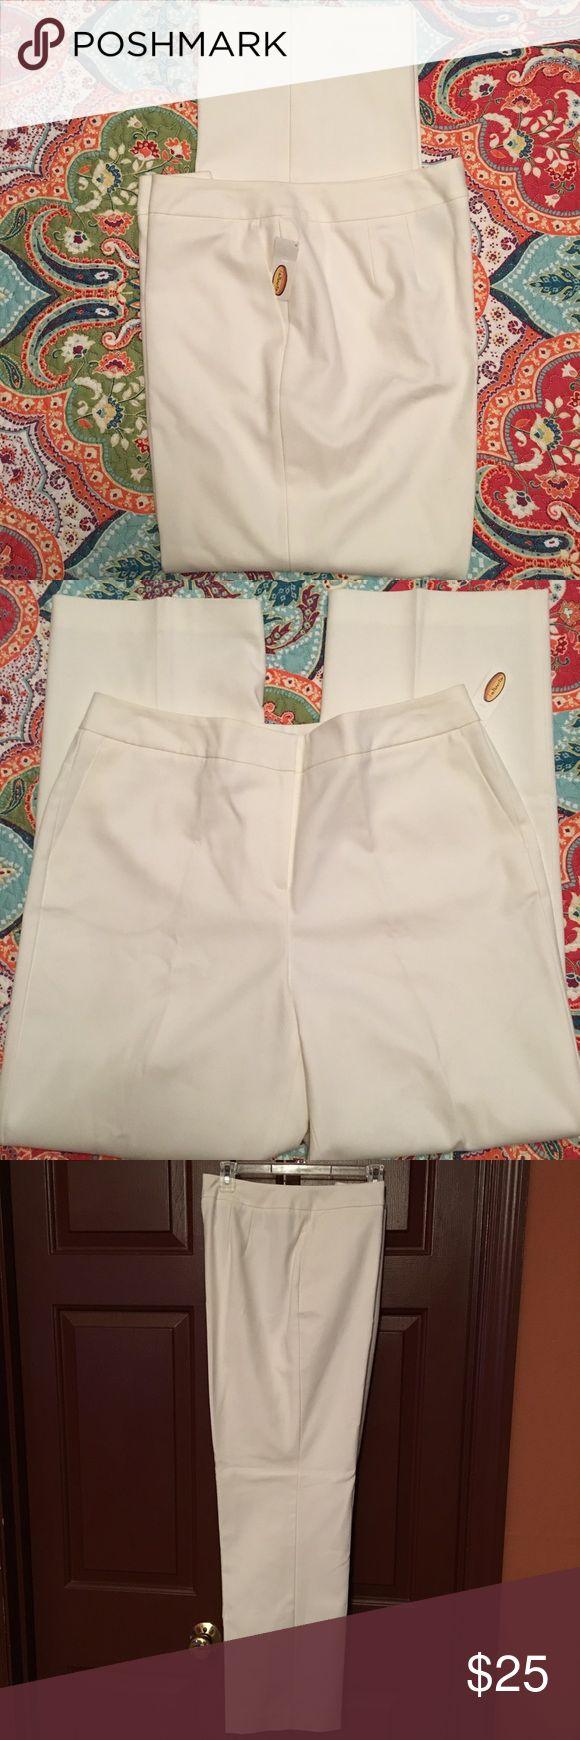 "Talbots White Dress Pants NWT, Size 14, white dress pants, lined, length 31"", stretch Talbots Pants Trousers"